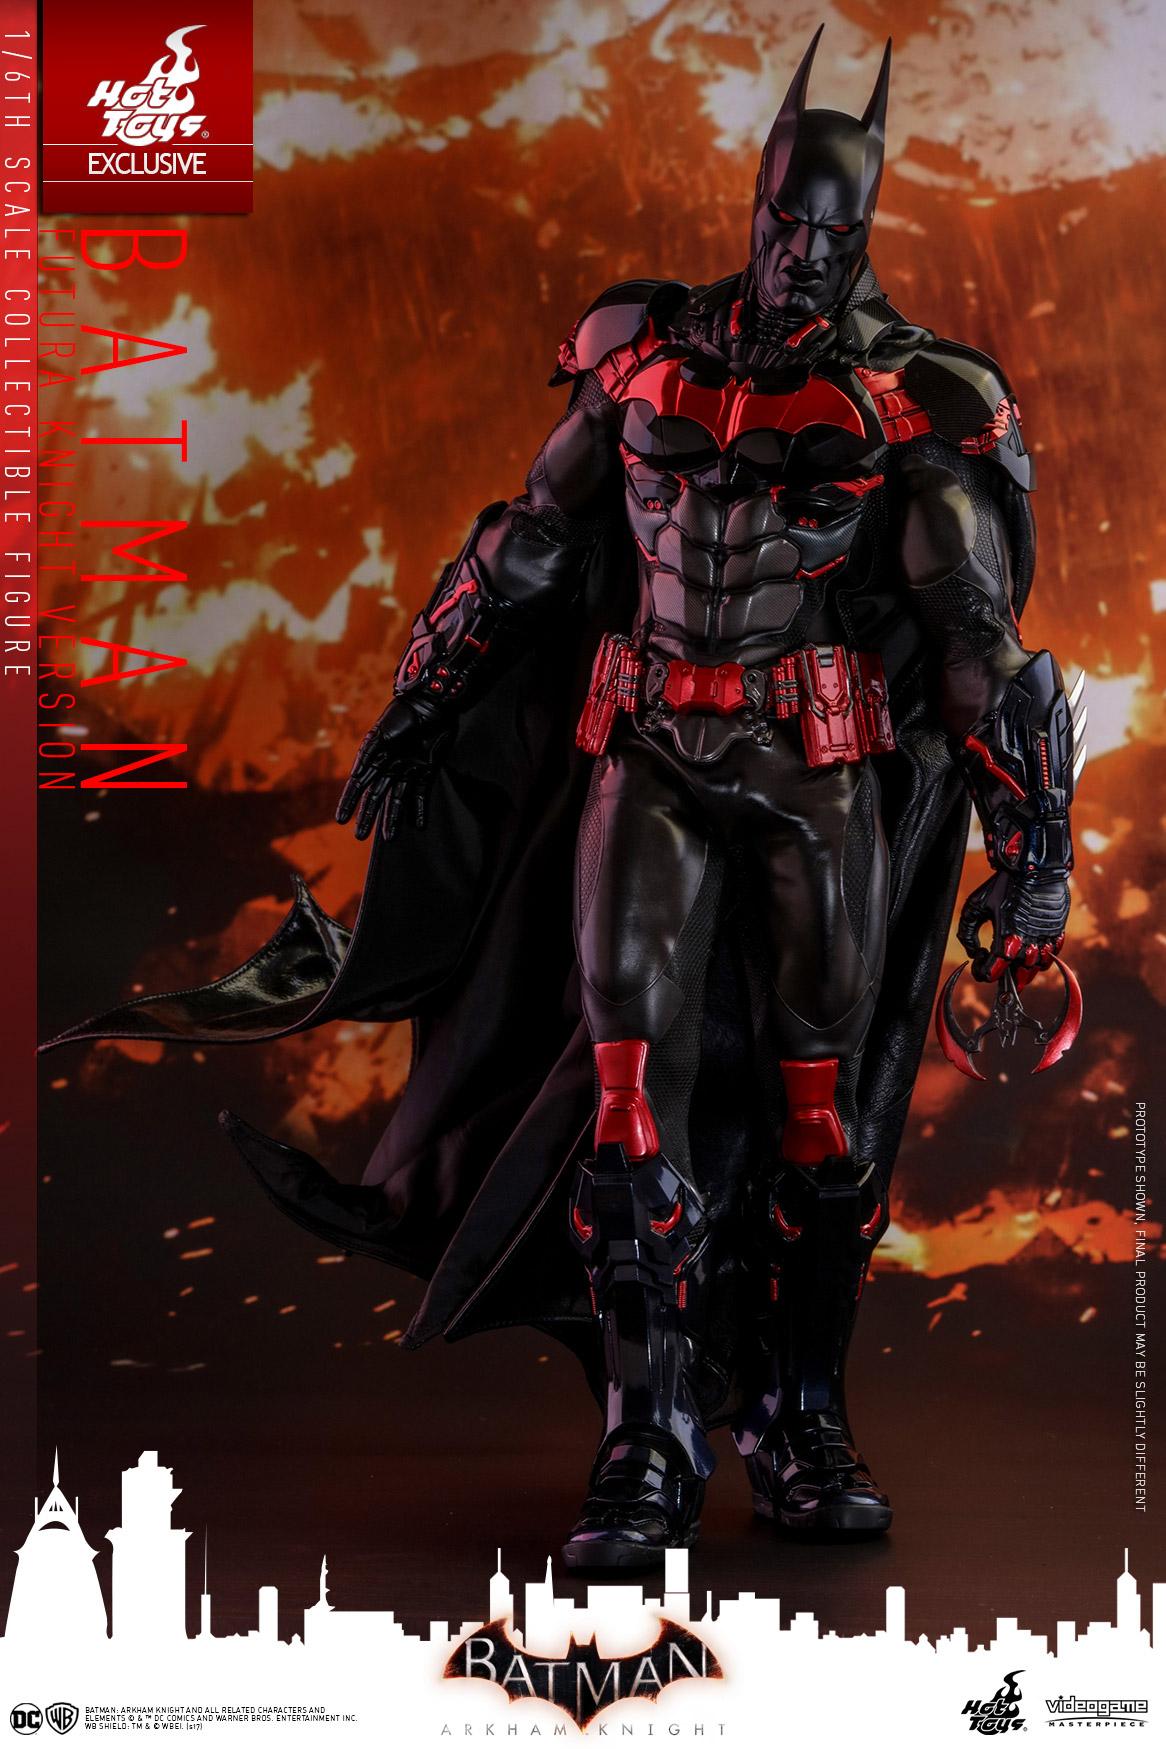 Hot-Toys---BAK---Batman-(Futura-Knight-Version)-collectible-figure_PR1